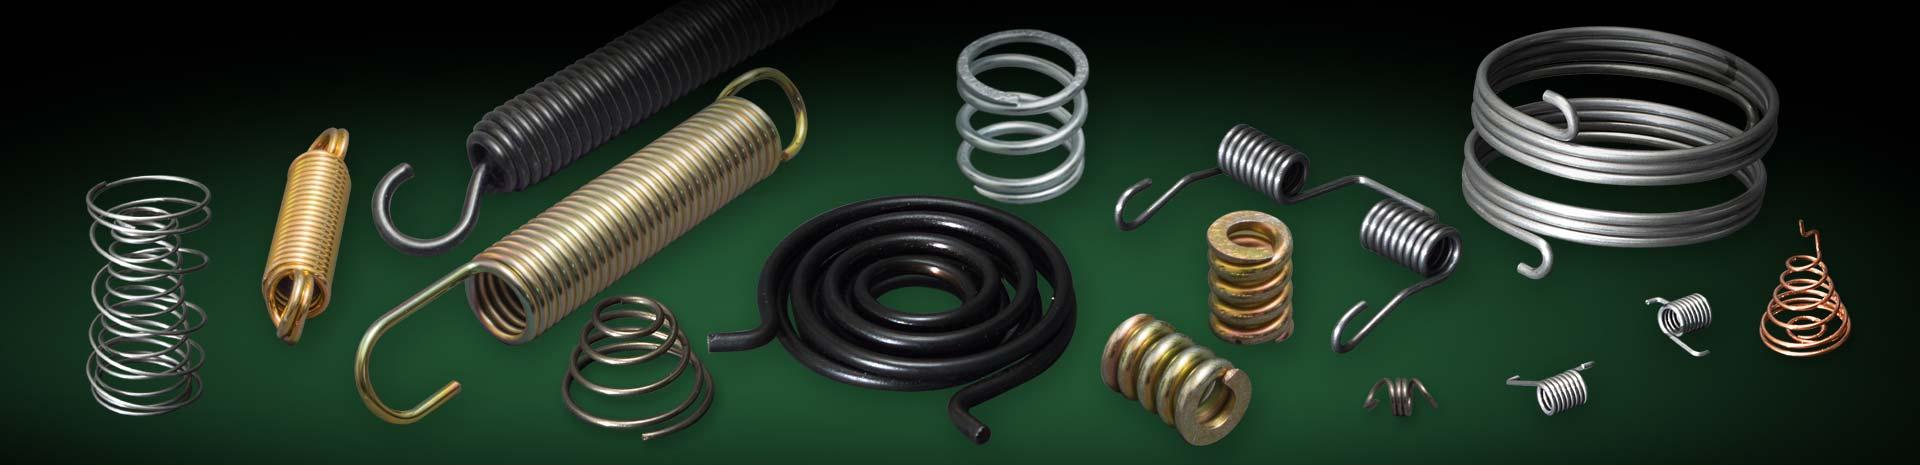 spring manufacturer, coil springs, metal springs